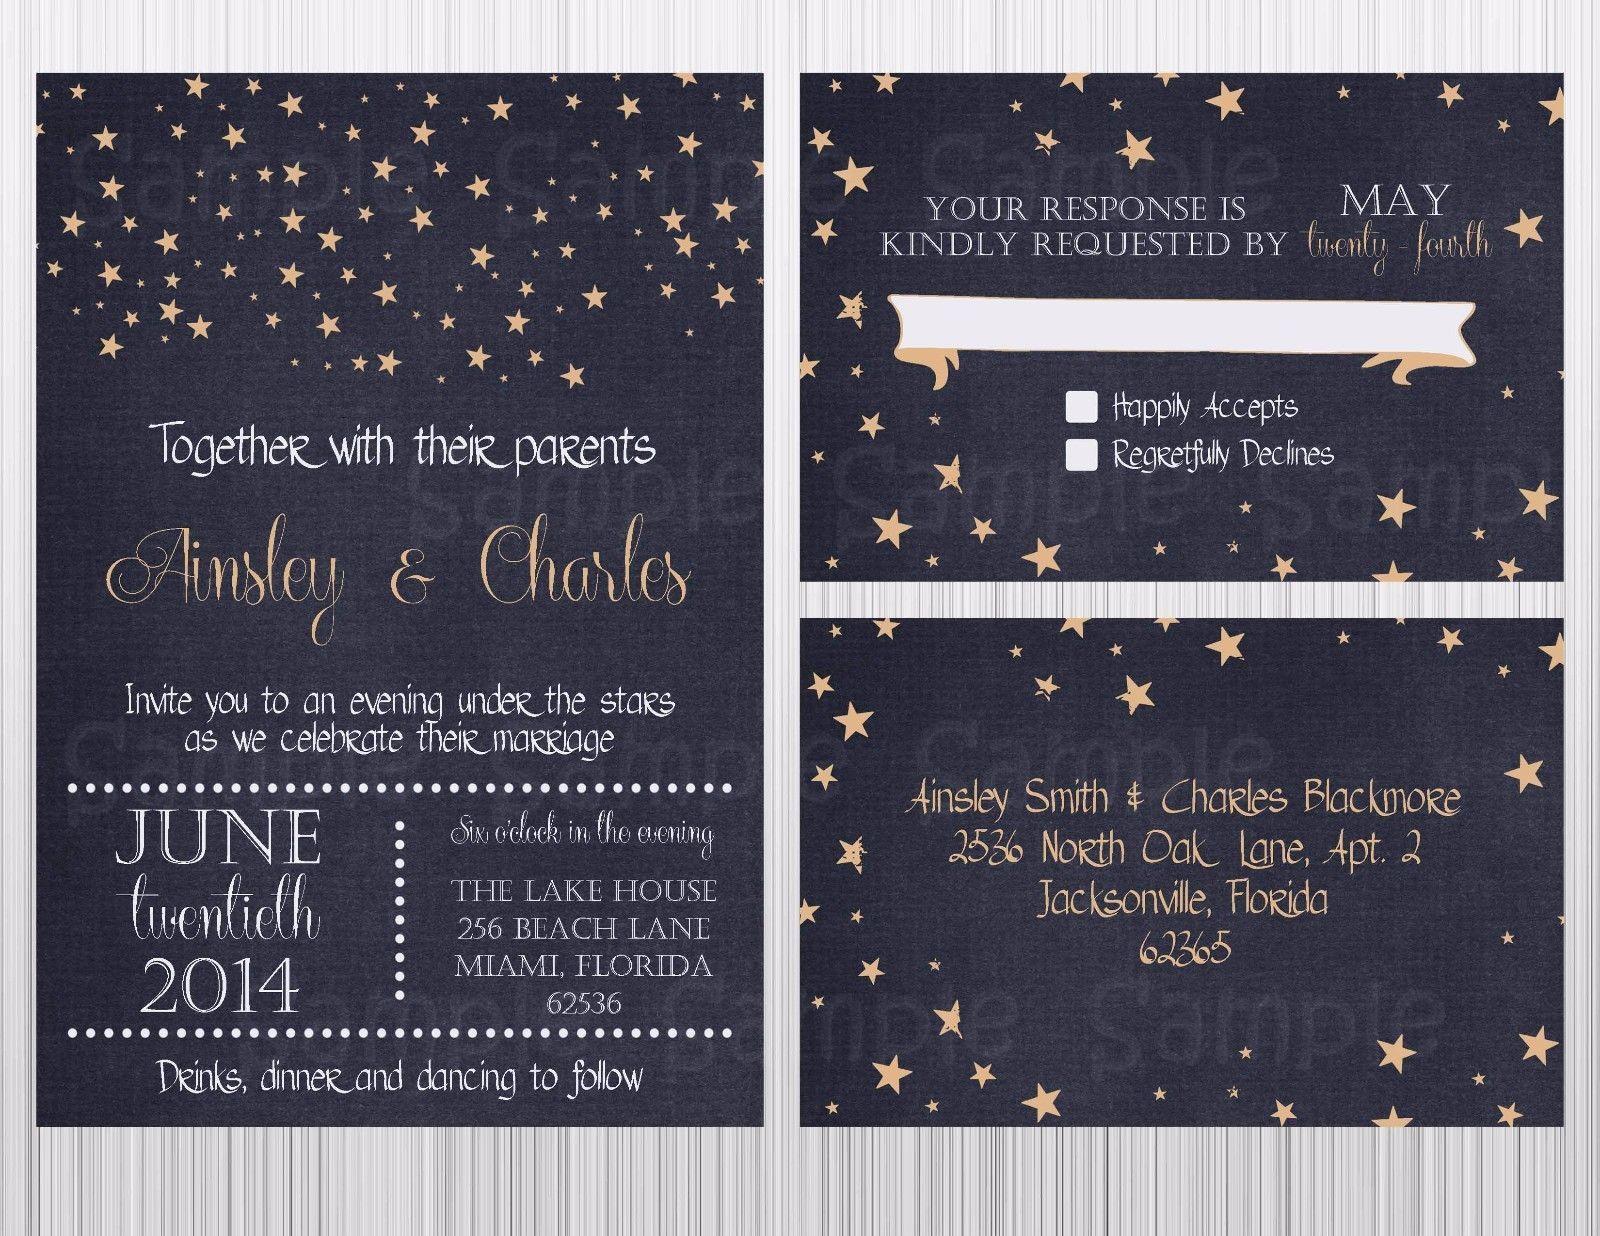 Stars Wedding Invitation Set, Invitation, RSVP Postcard Envelopes Personalized - $21.00